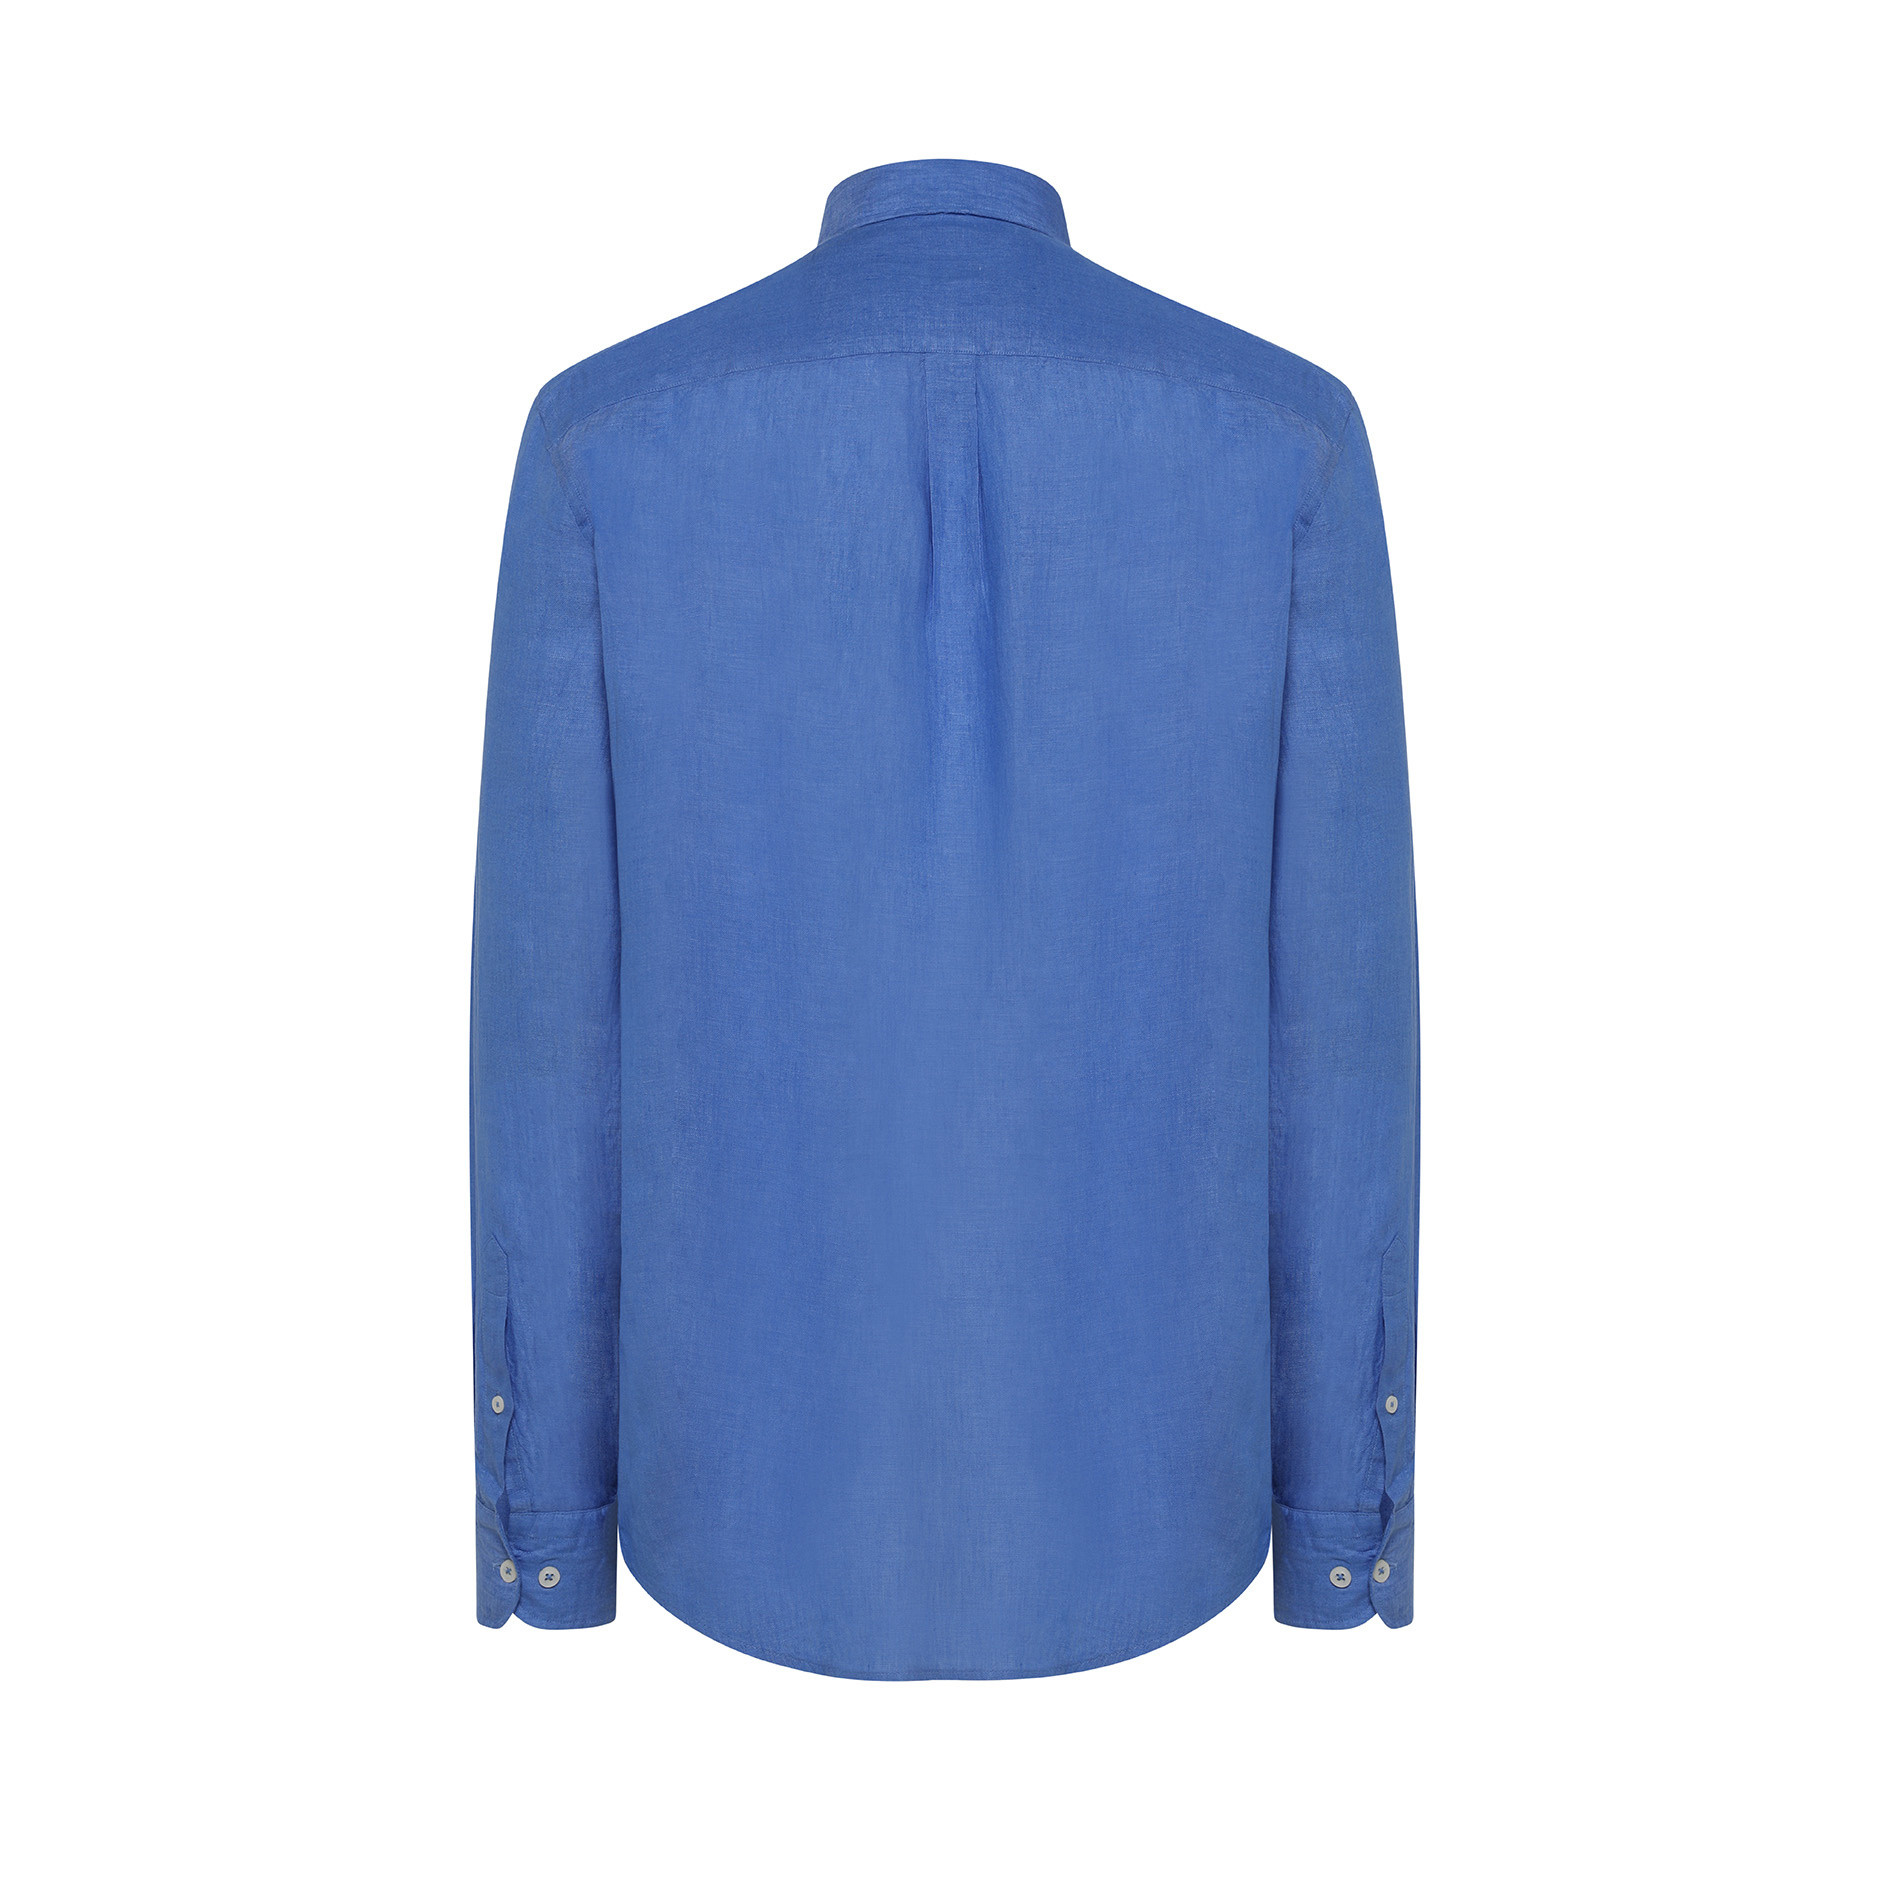 Camicia puro lino tailor fit Luca D'Altieri, Azzurro scuro, large image number 1